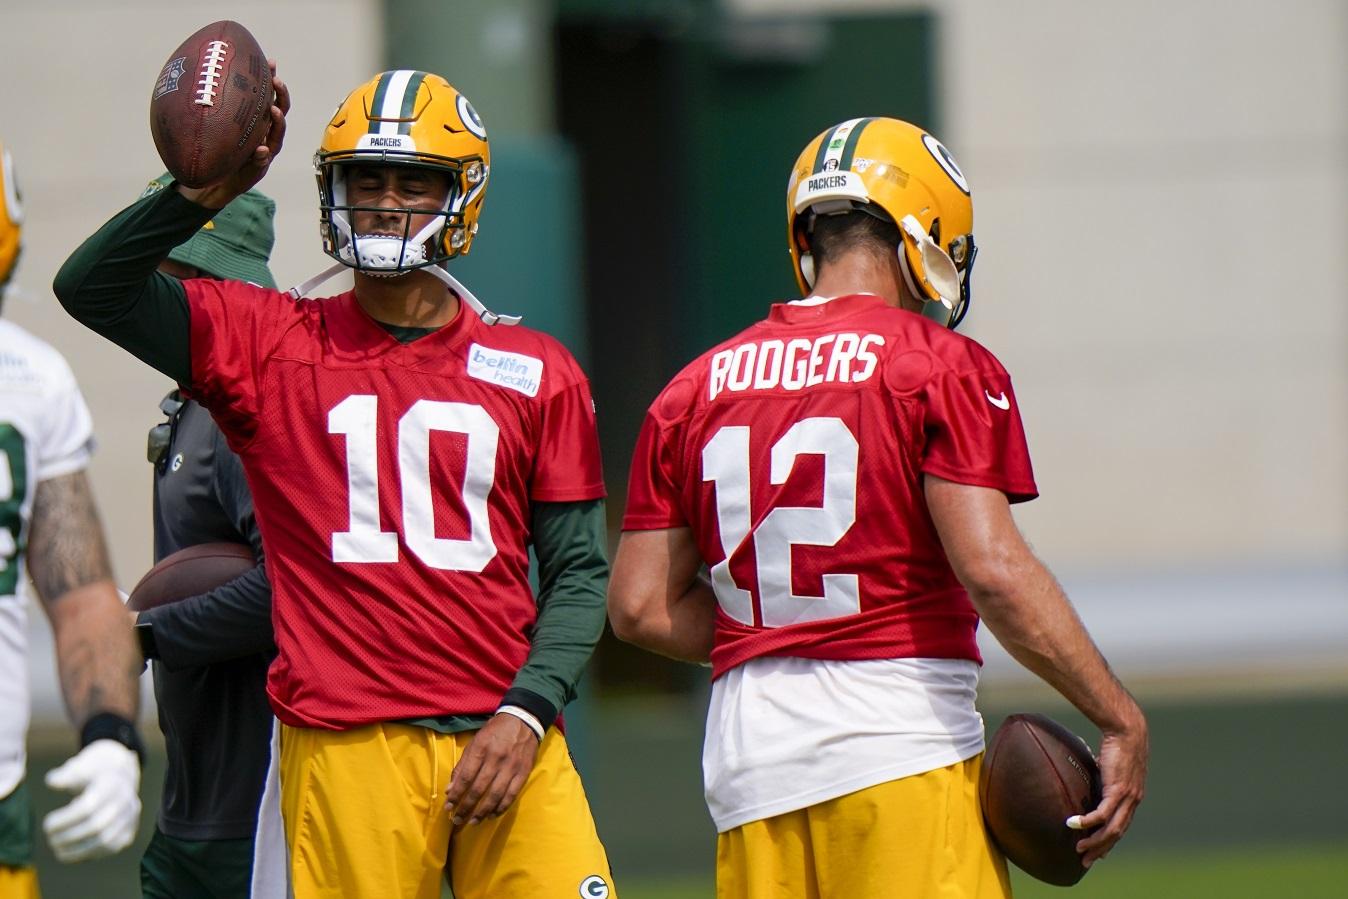 QB Rodgers' uncertain status dominates Packers' camp